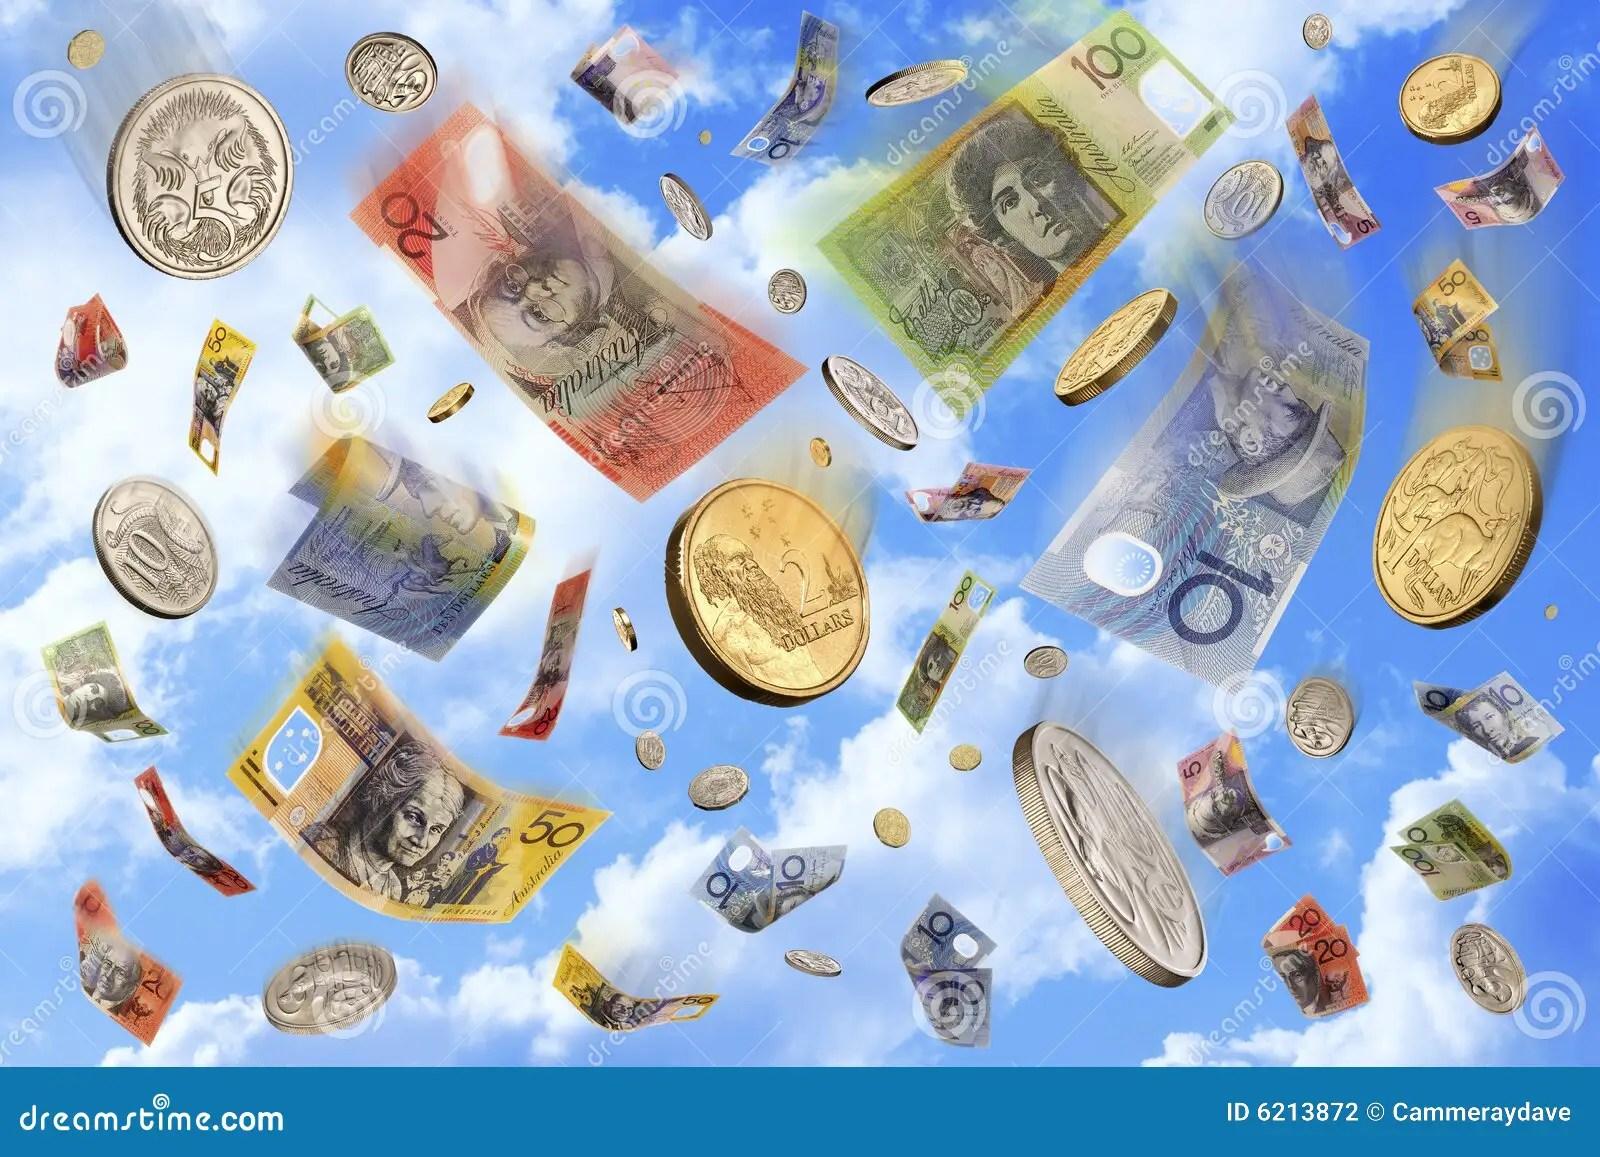 Falling Money Hd Wallpaper Raining Falling Australian Money Dollars Stock